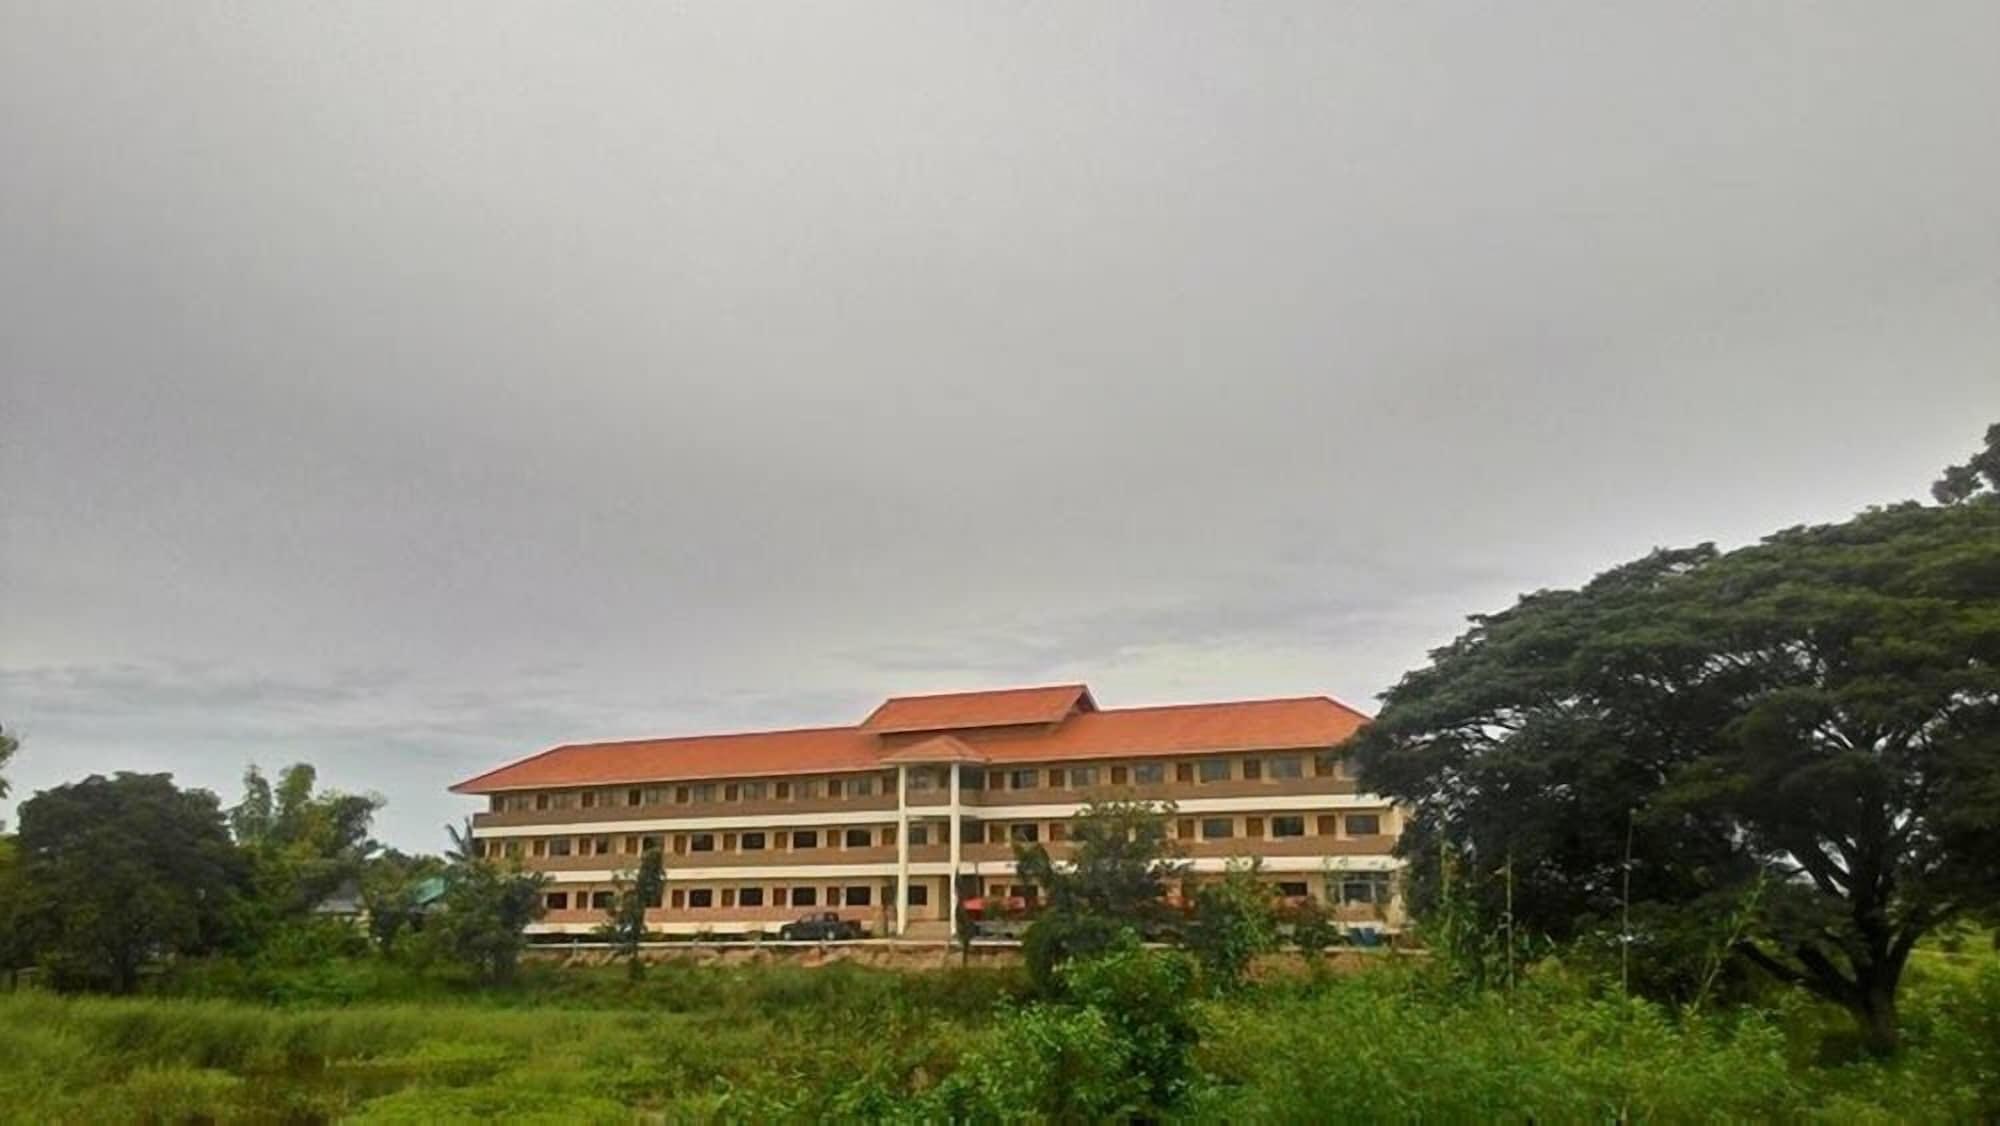 JV. Place, Muang Maha Sarakam